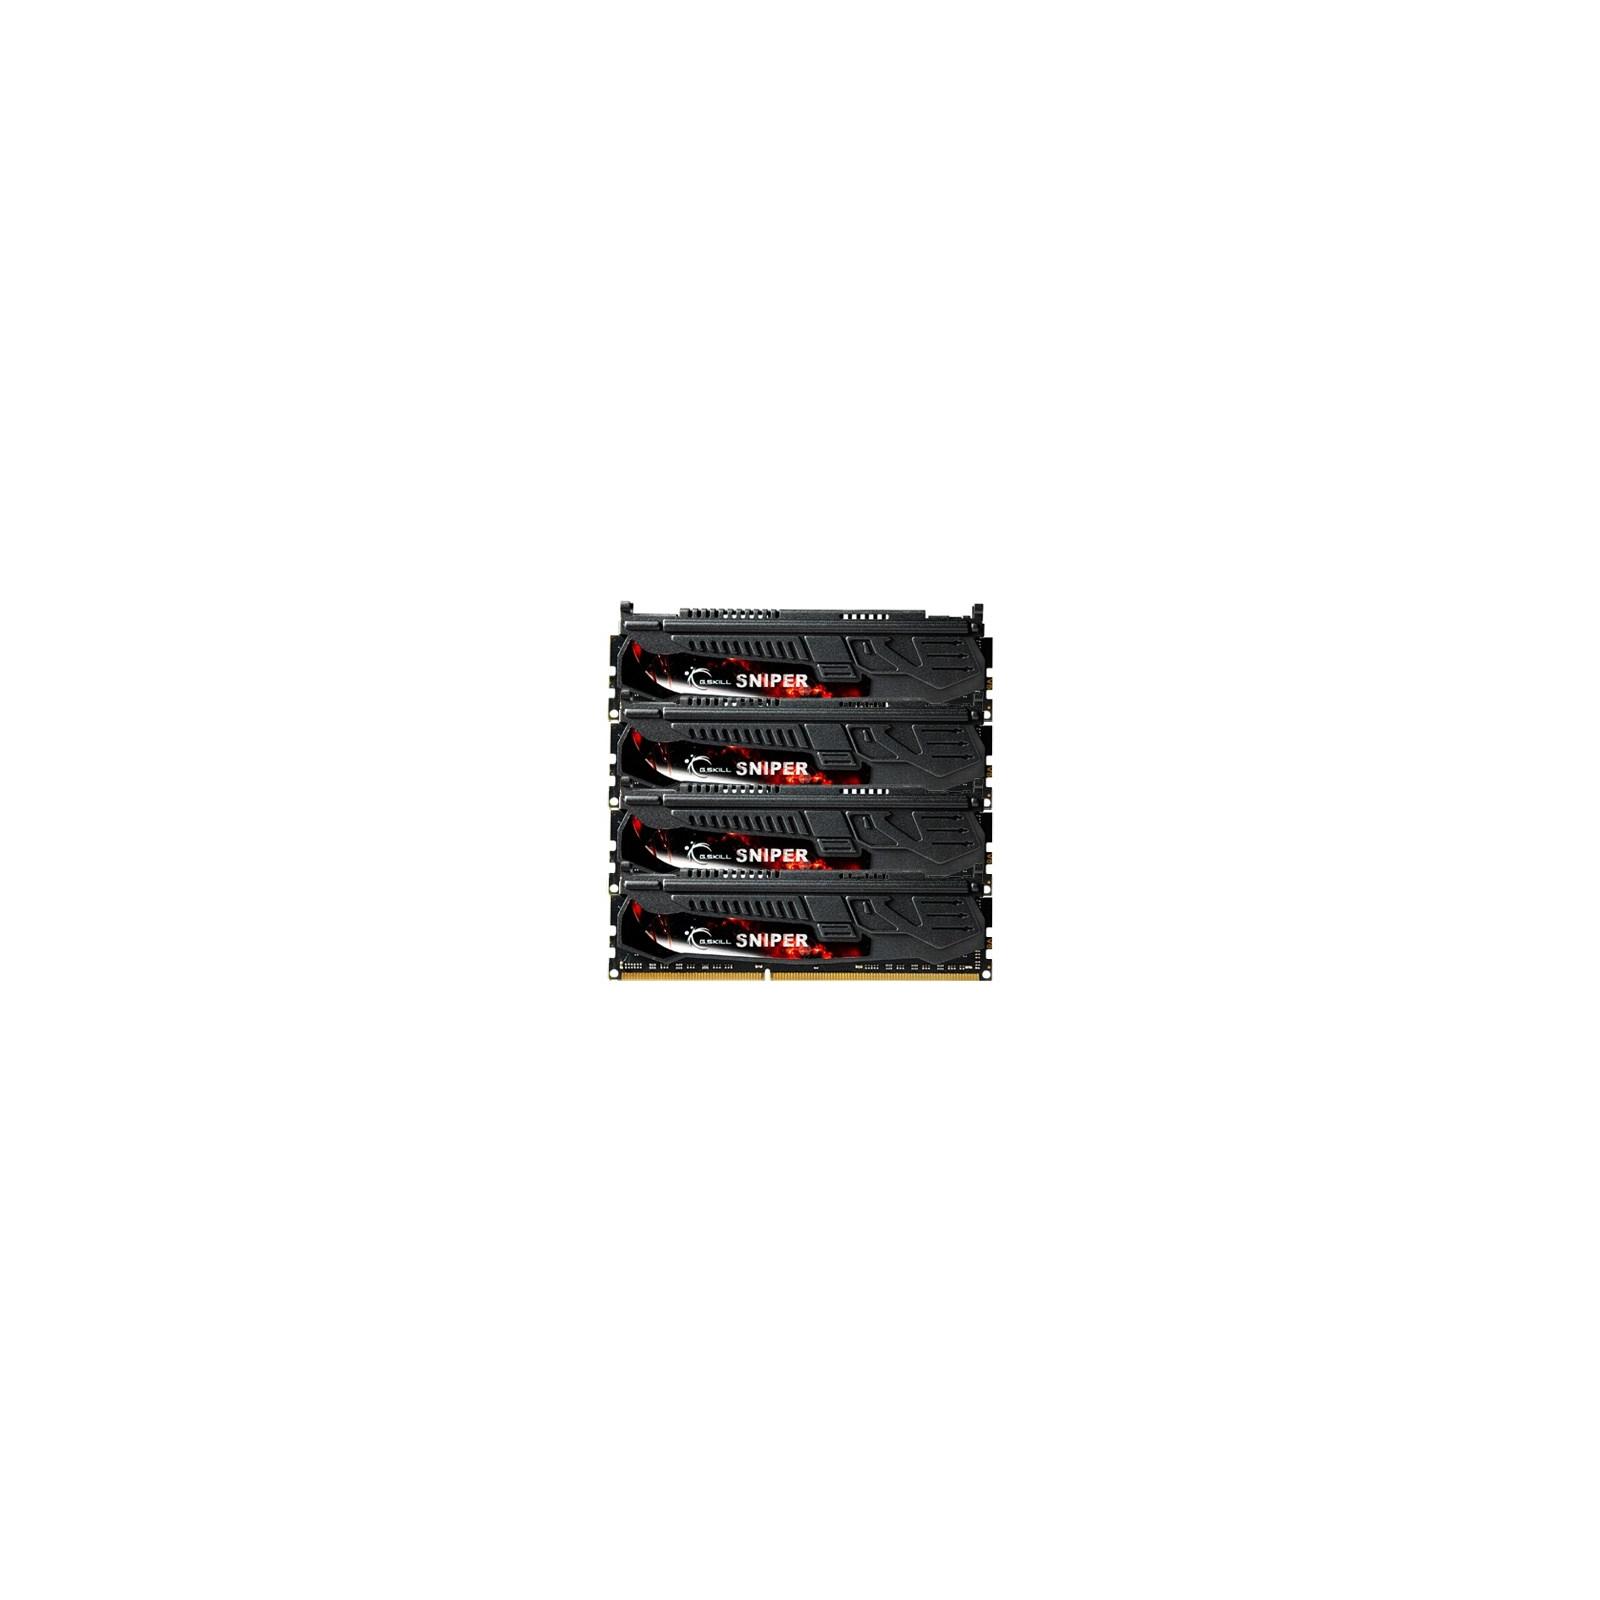 Модуль памяти для компьютера DDR3 32GB (4x8GB) 1866 MHz G.Skill (F3-1866C10Q-32GSR)